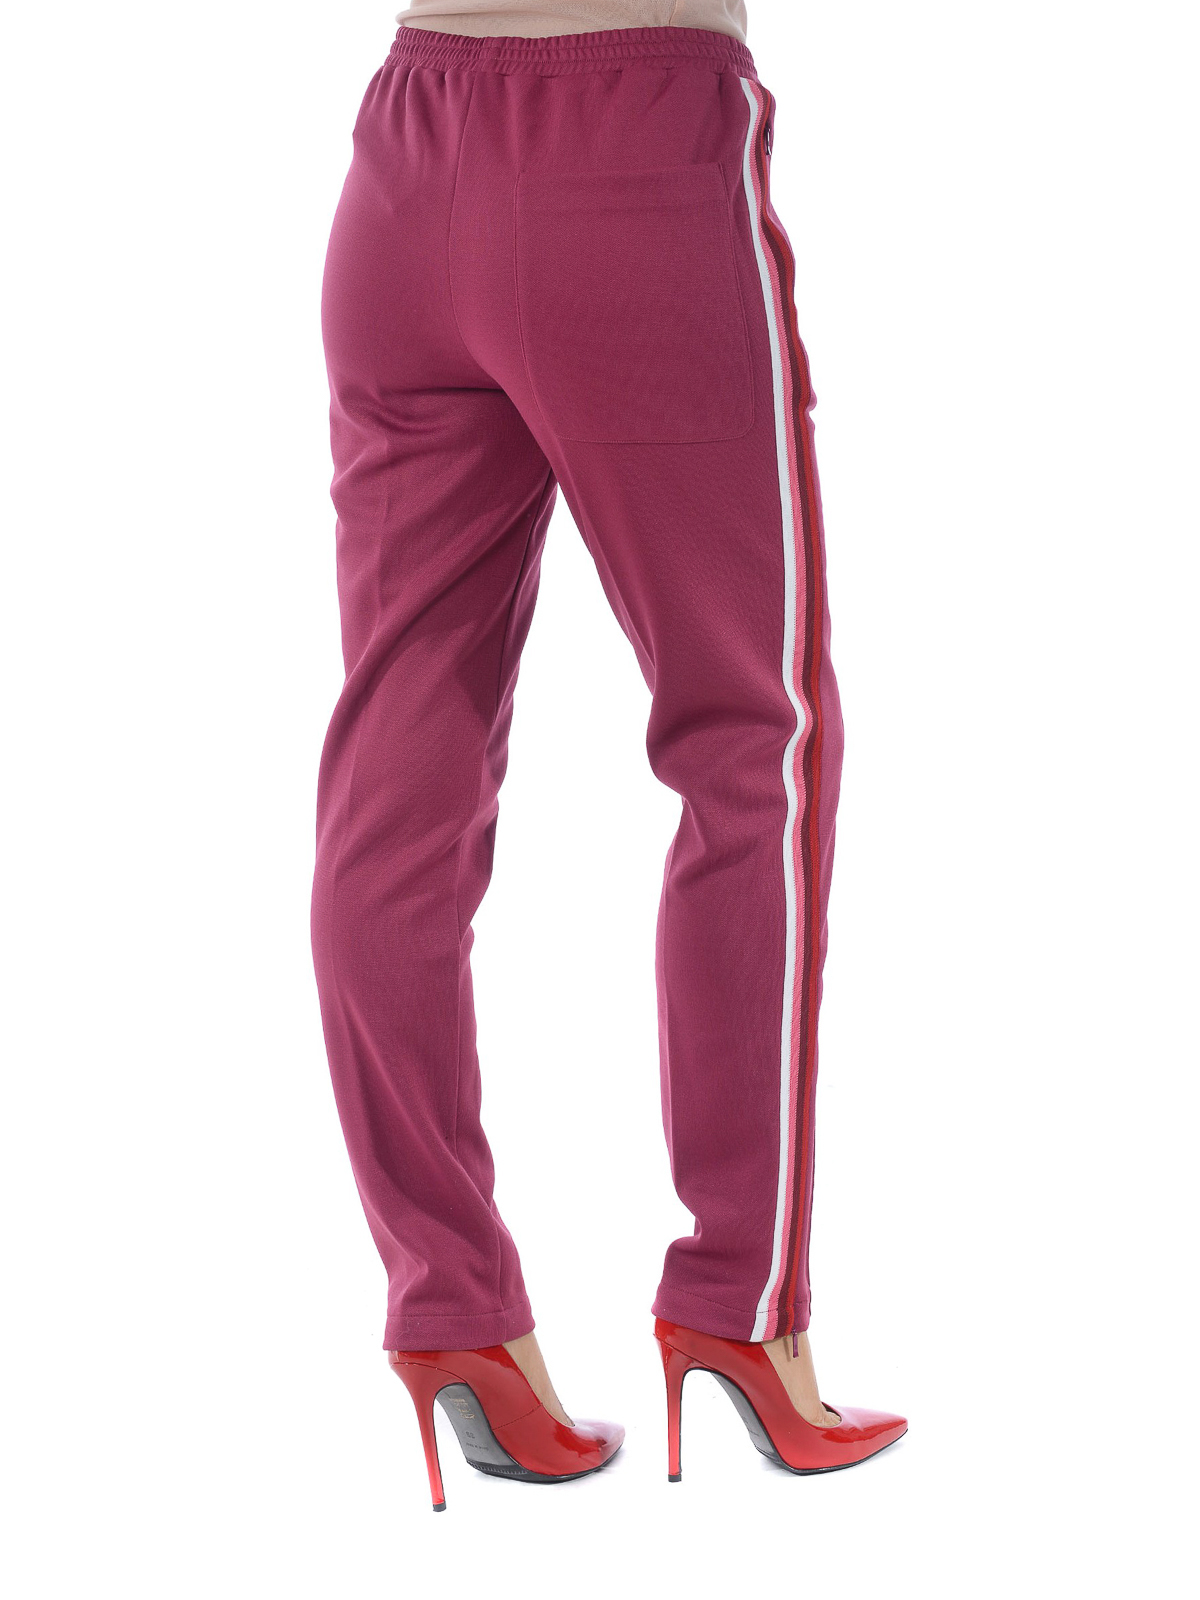 2a008fa941 Moncler - Pantalone da jogging con bande laterali - pantaloni casual ...